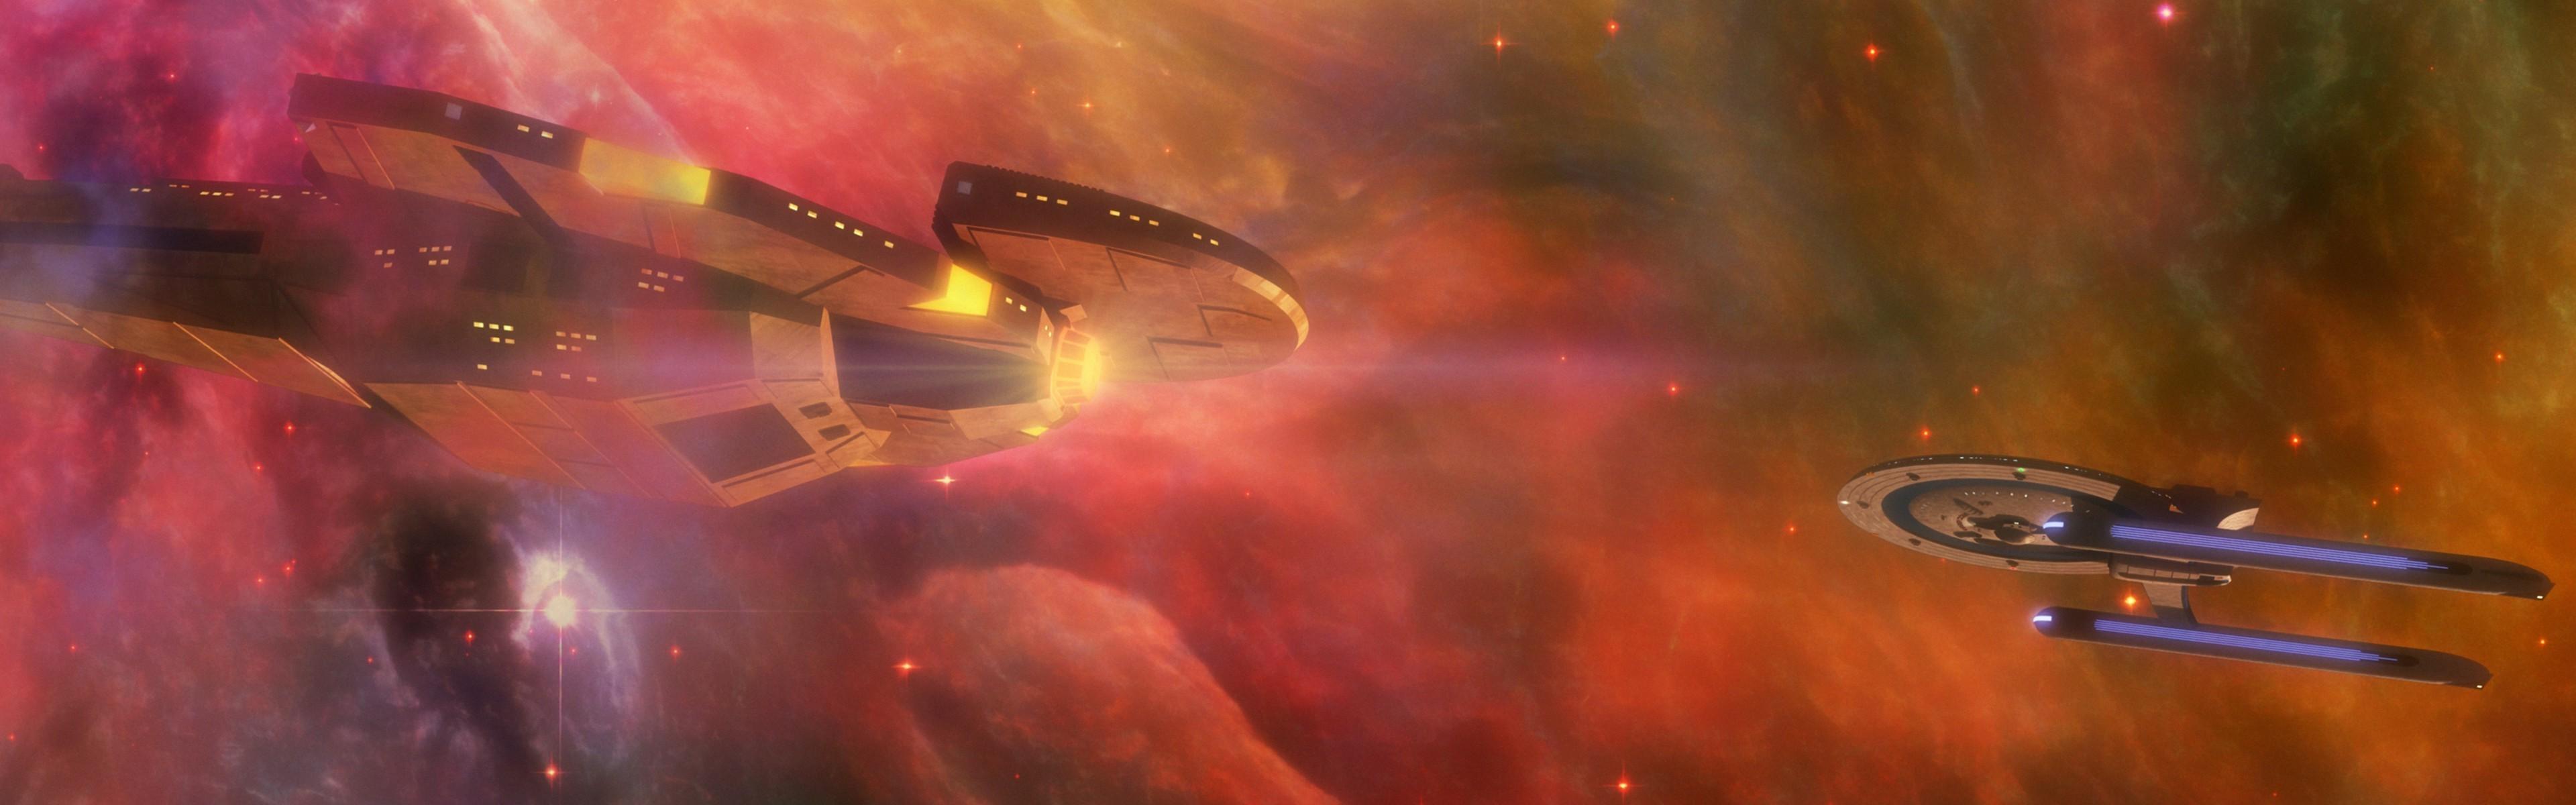 Star Trek, Space, Nebula, Stars, Spaceship, Dual Monitors, Multiple Display  Wallpapers HD / Desktop and Mobile Backgrounds